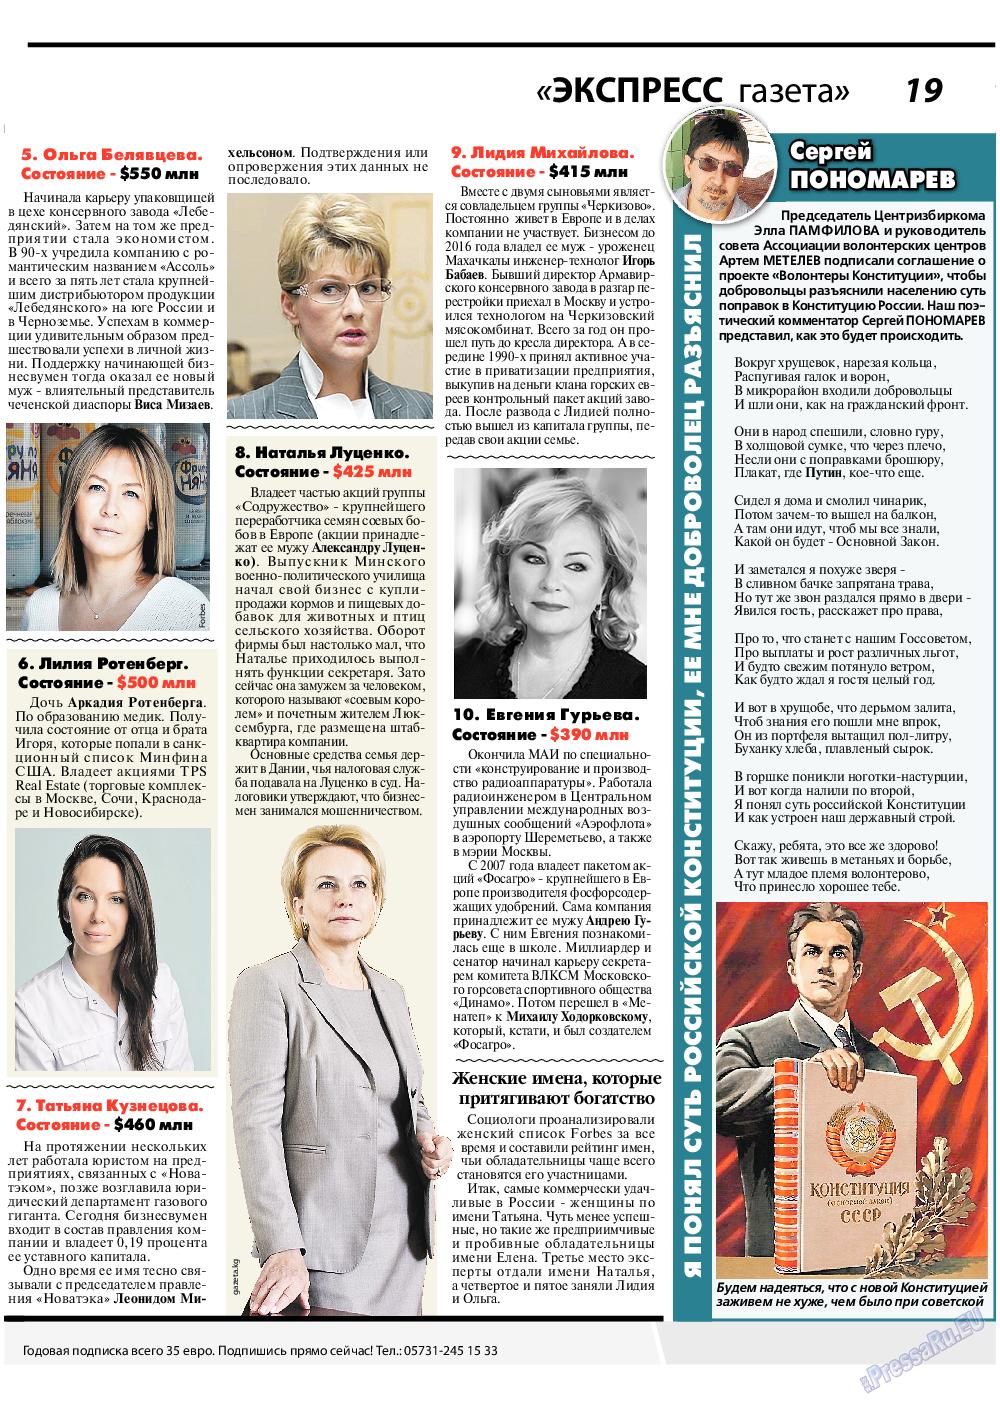 Экспресс газета (газета). 2020 год, номер 4, стр. 19